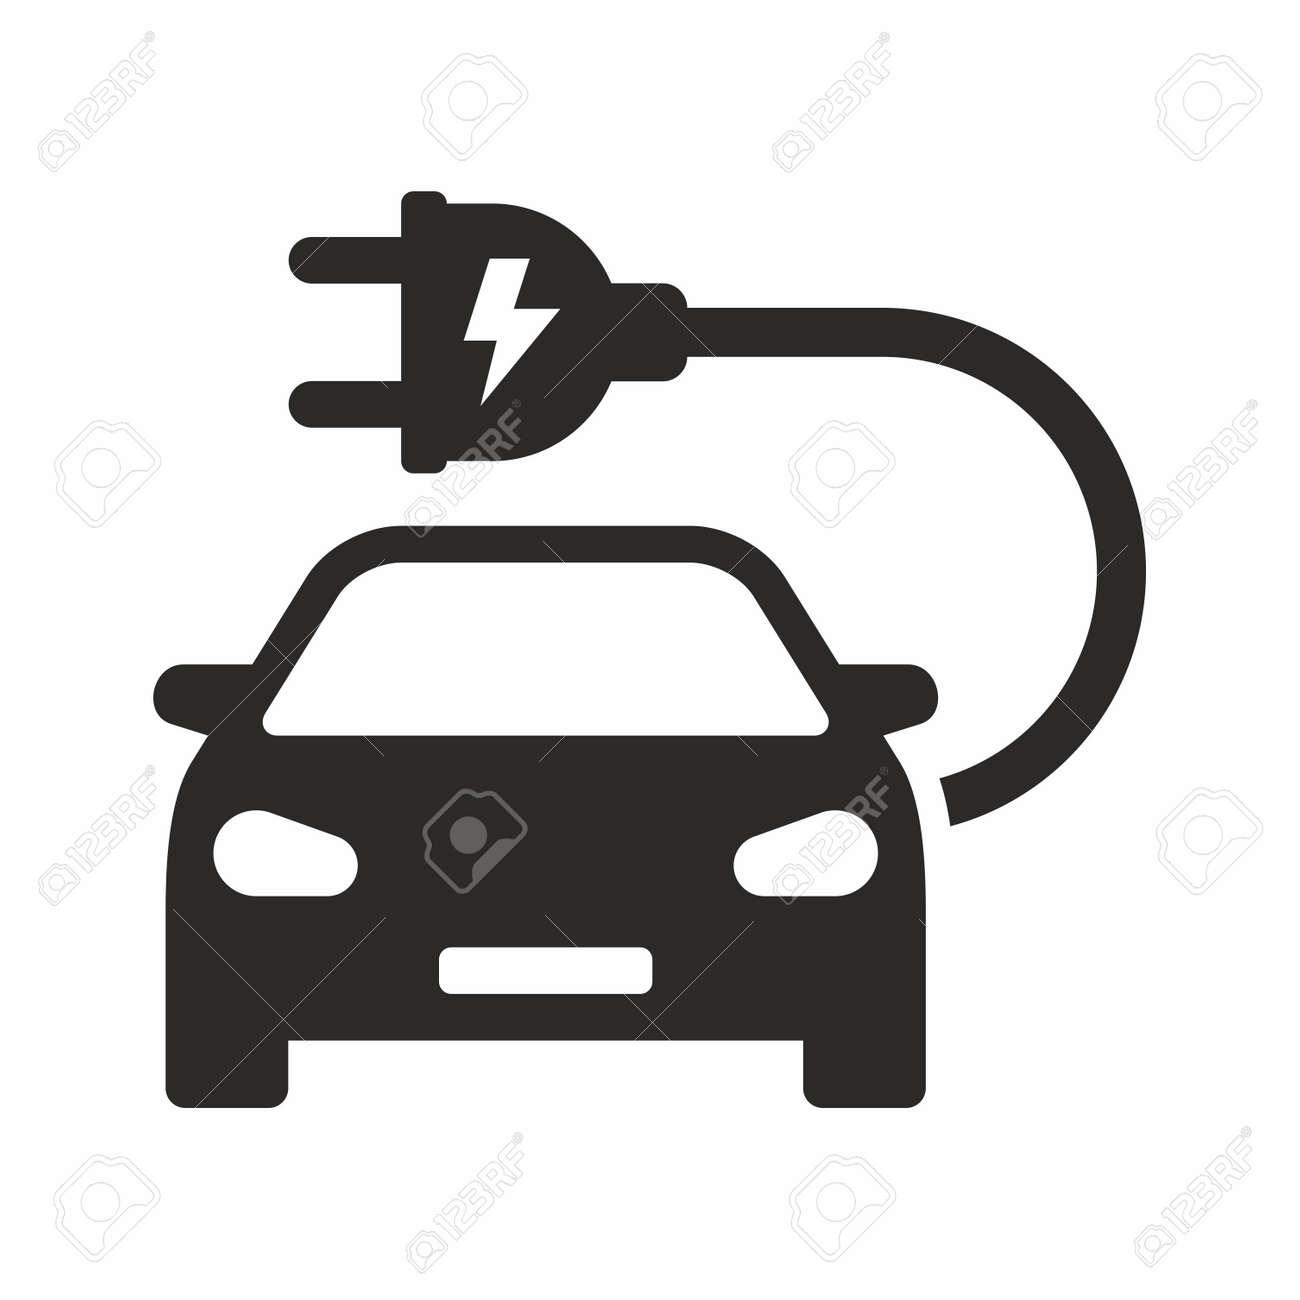 Electric Car Icon Vector Design Royalty Free Cliparts Vectors And